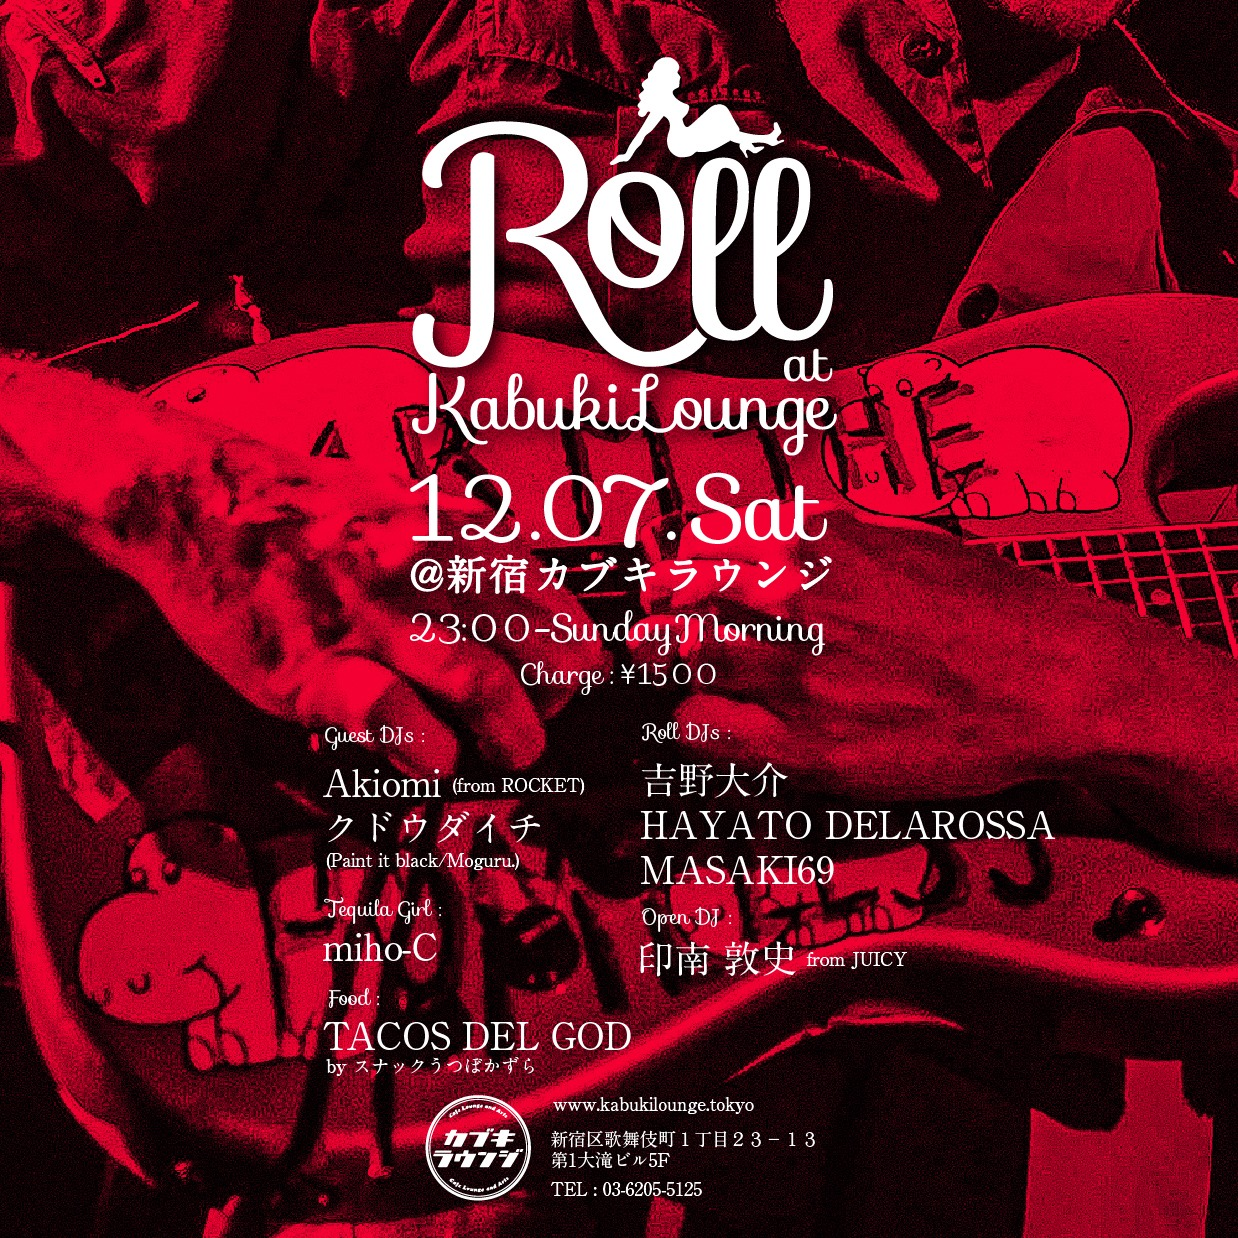 12.07.sat Roll @新宿カブキラウンジ 23:00-Sundaymorning